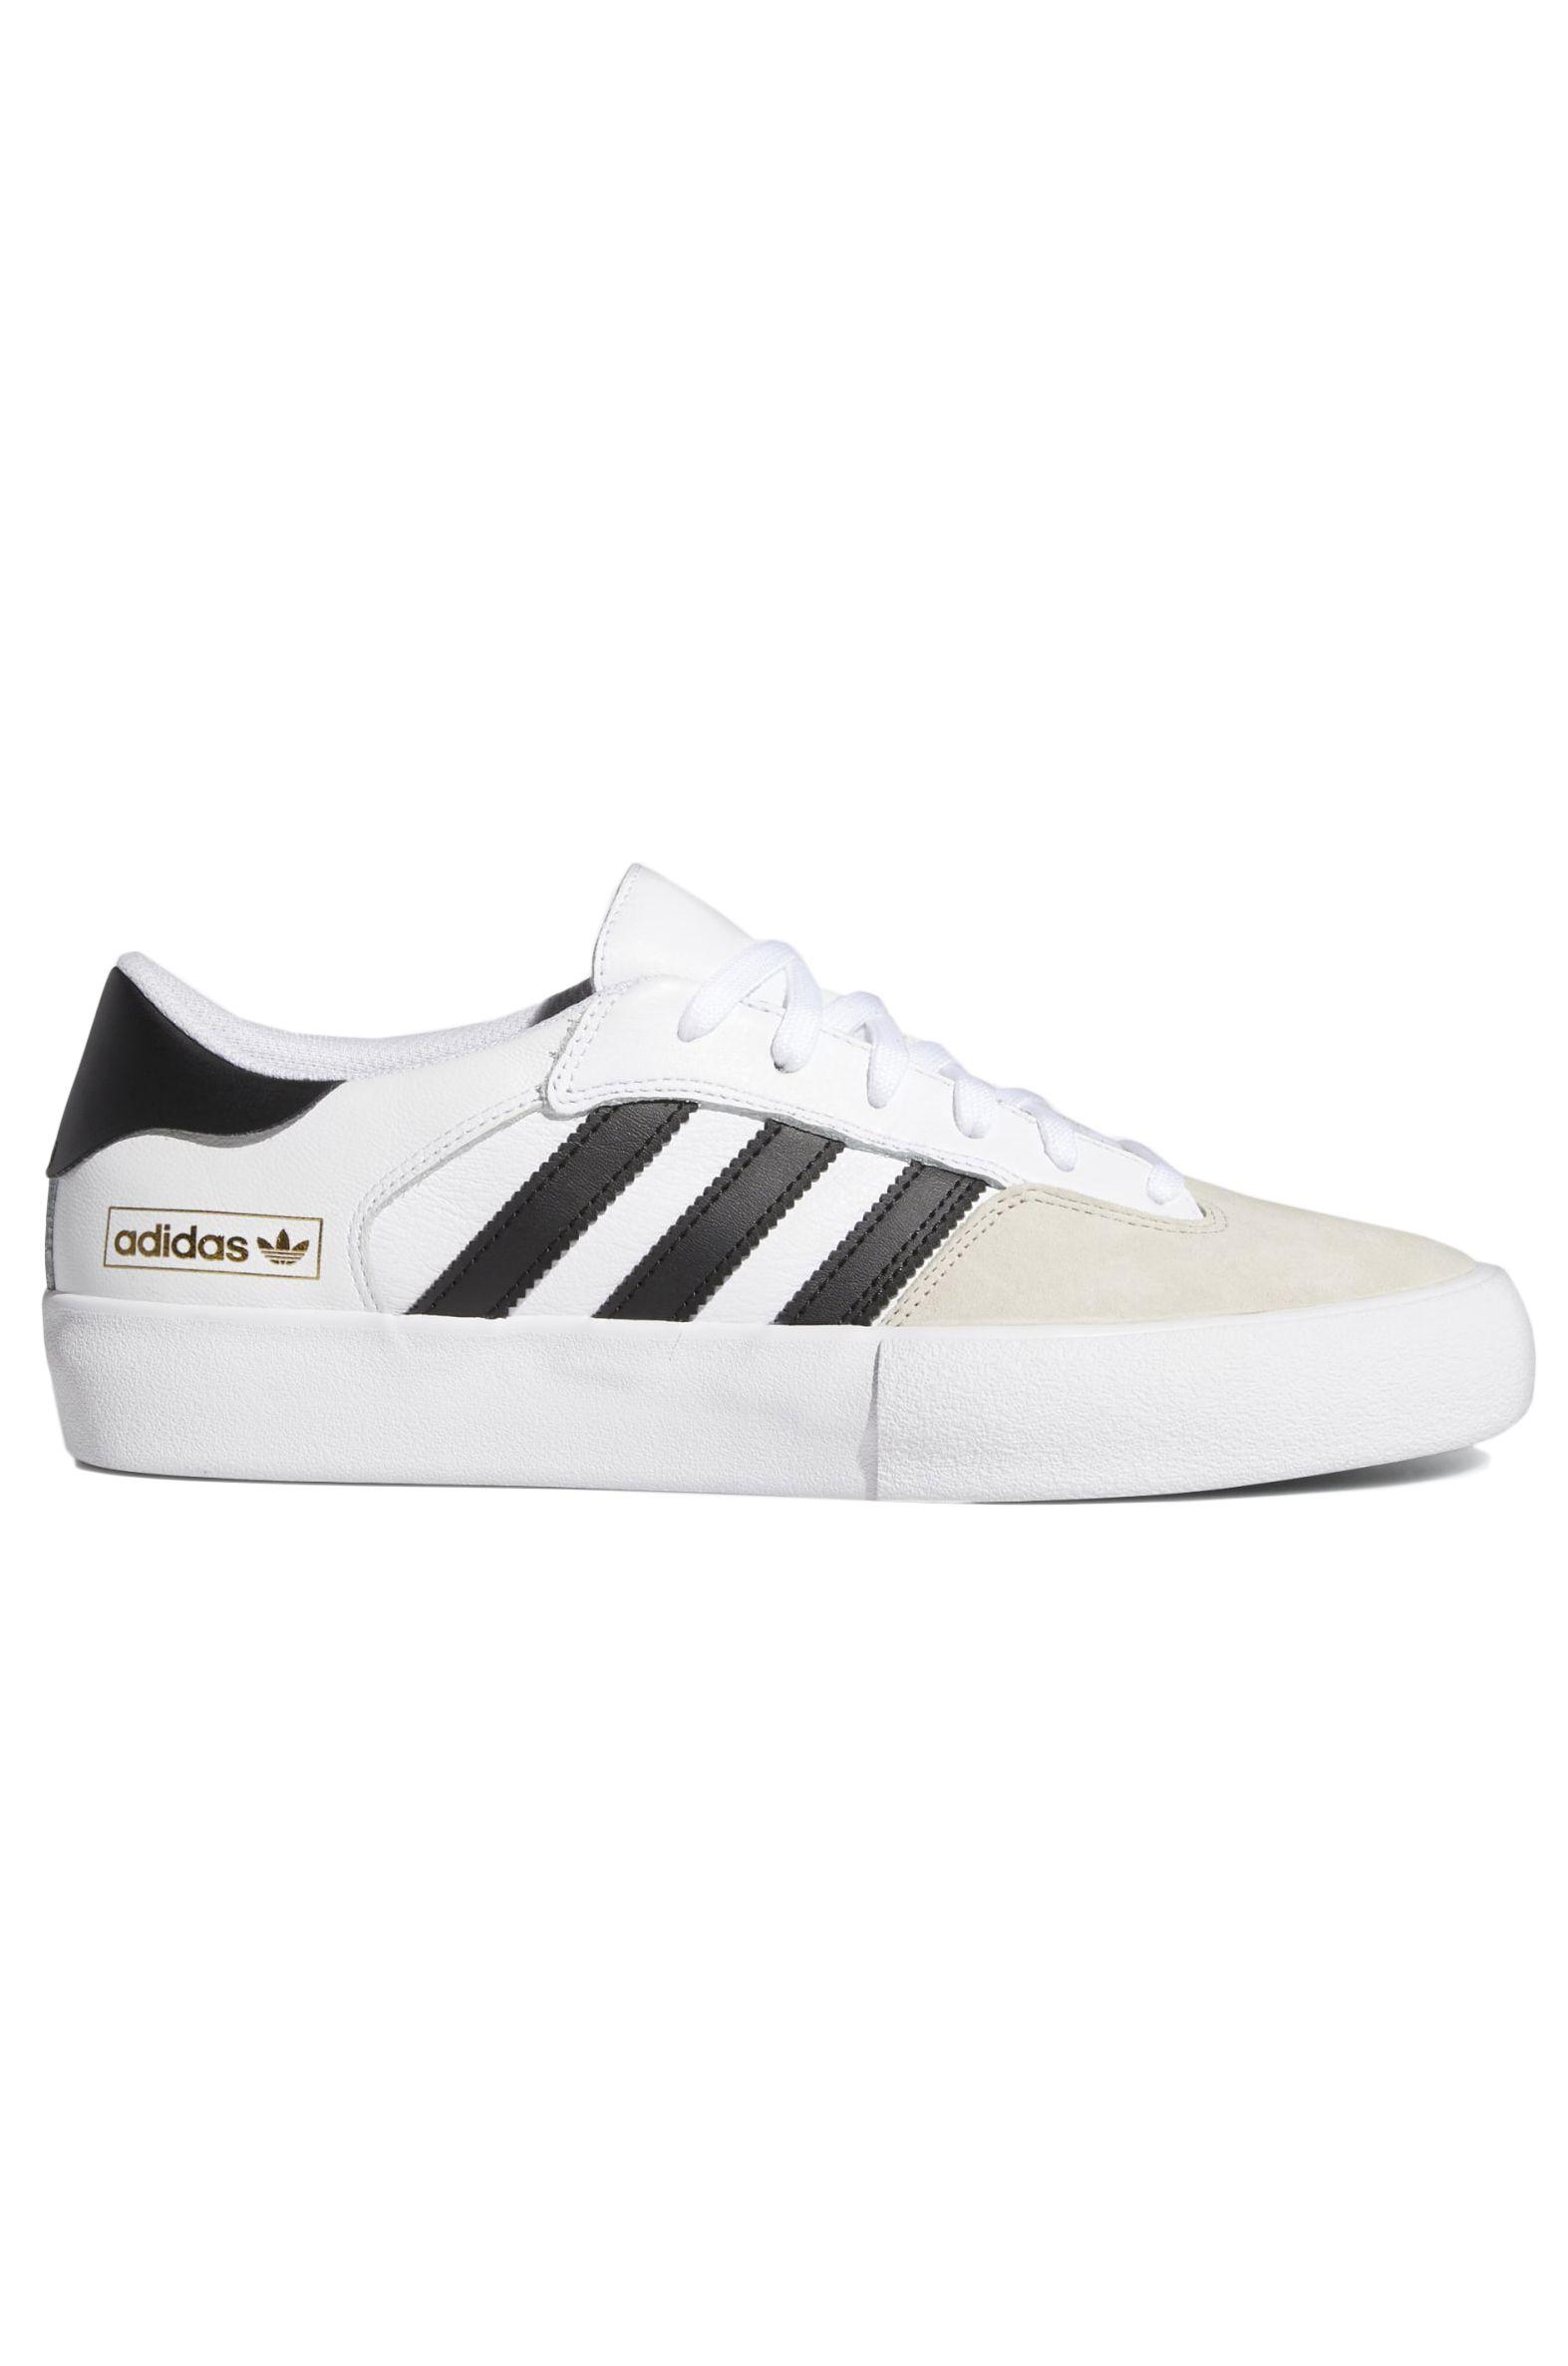 Tenis Adidas MATCHBREAK SUPER Ftwr White/Core Black/Clear Brown